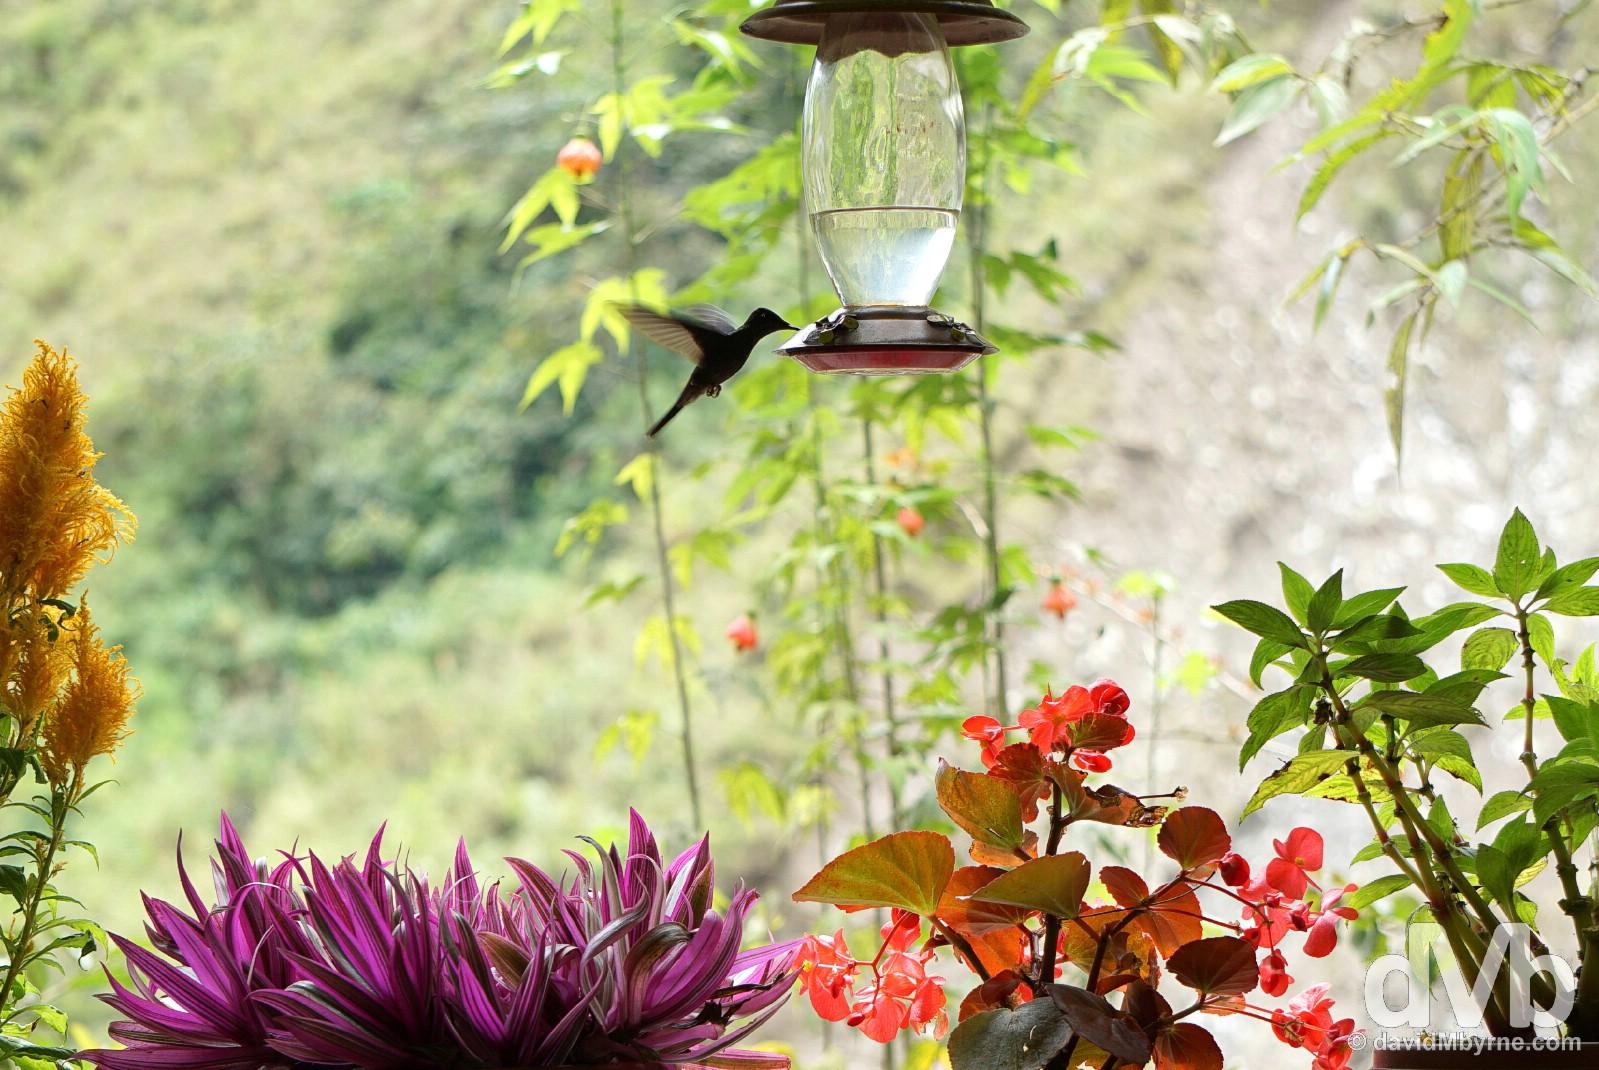 A hummingbird near the base of the Manto de la Novia (Bride's Veil) waterfall in Pastaza Valley, Ecuador. July 9, 2015.